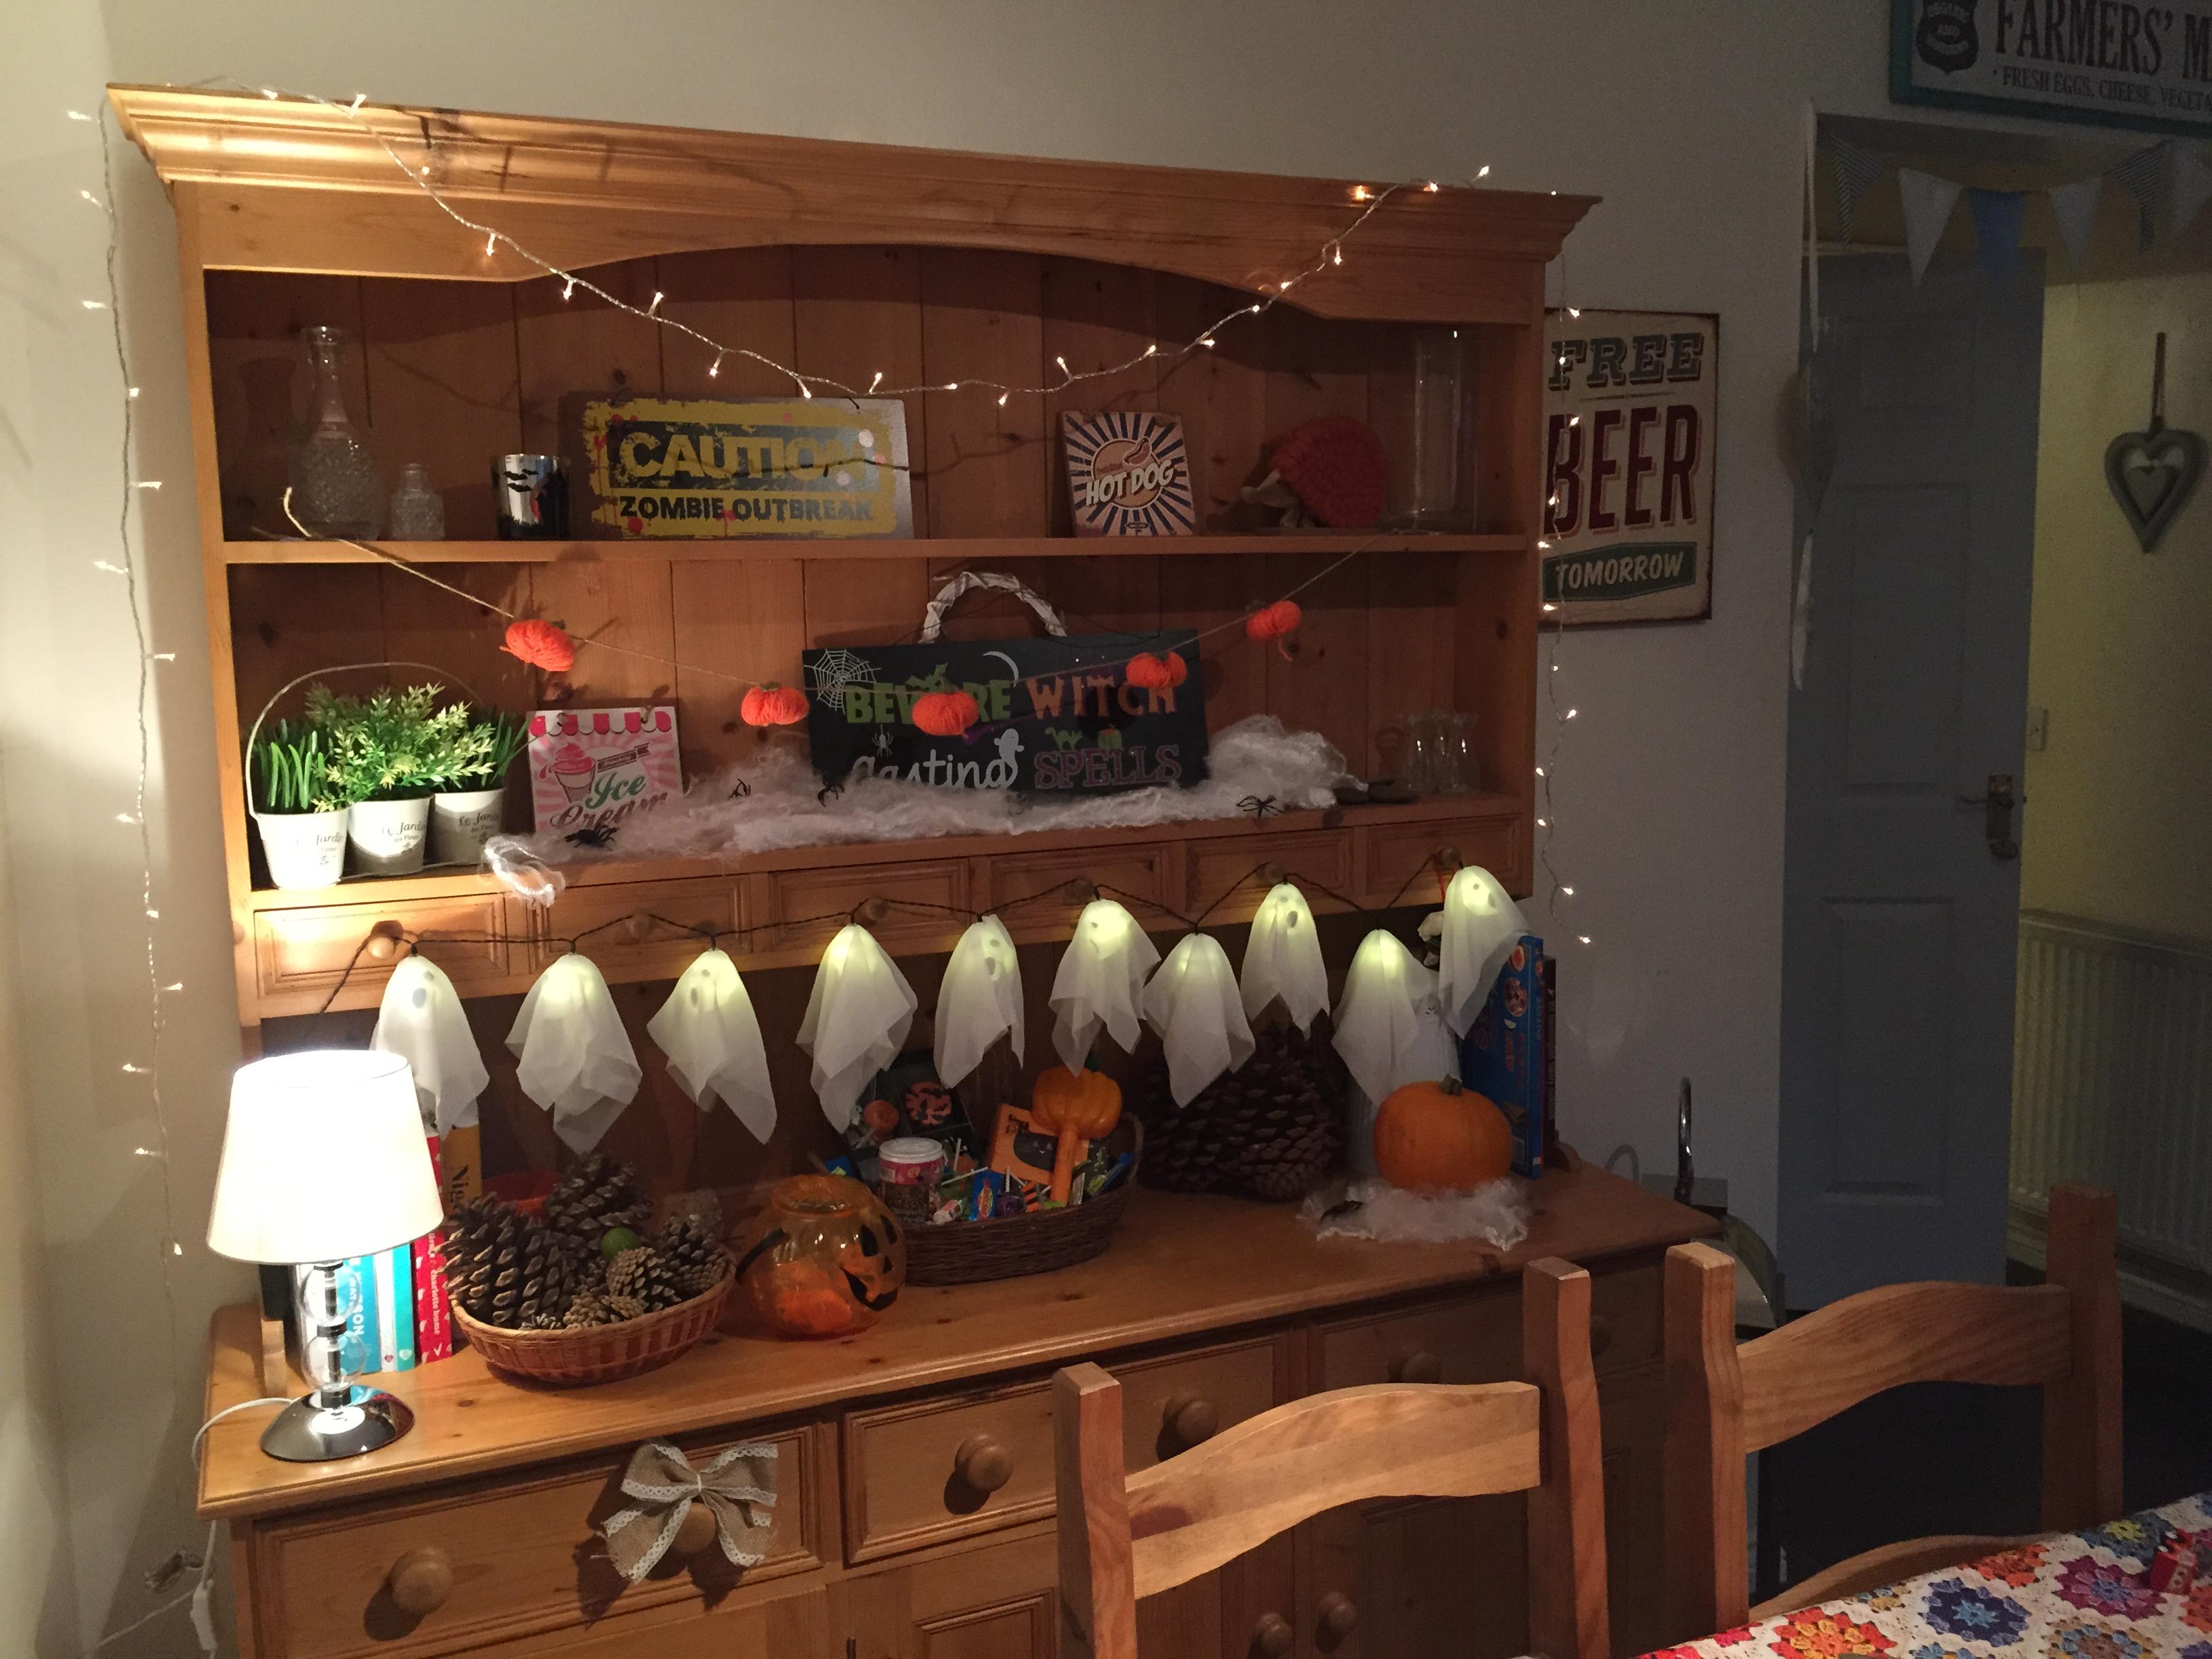 Home bargains bathroom cabinets - Halloween At Home Bargains Halloween At Home Bargains Me And B Make Tea